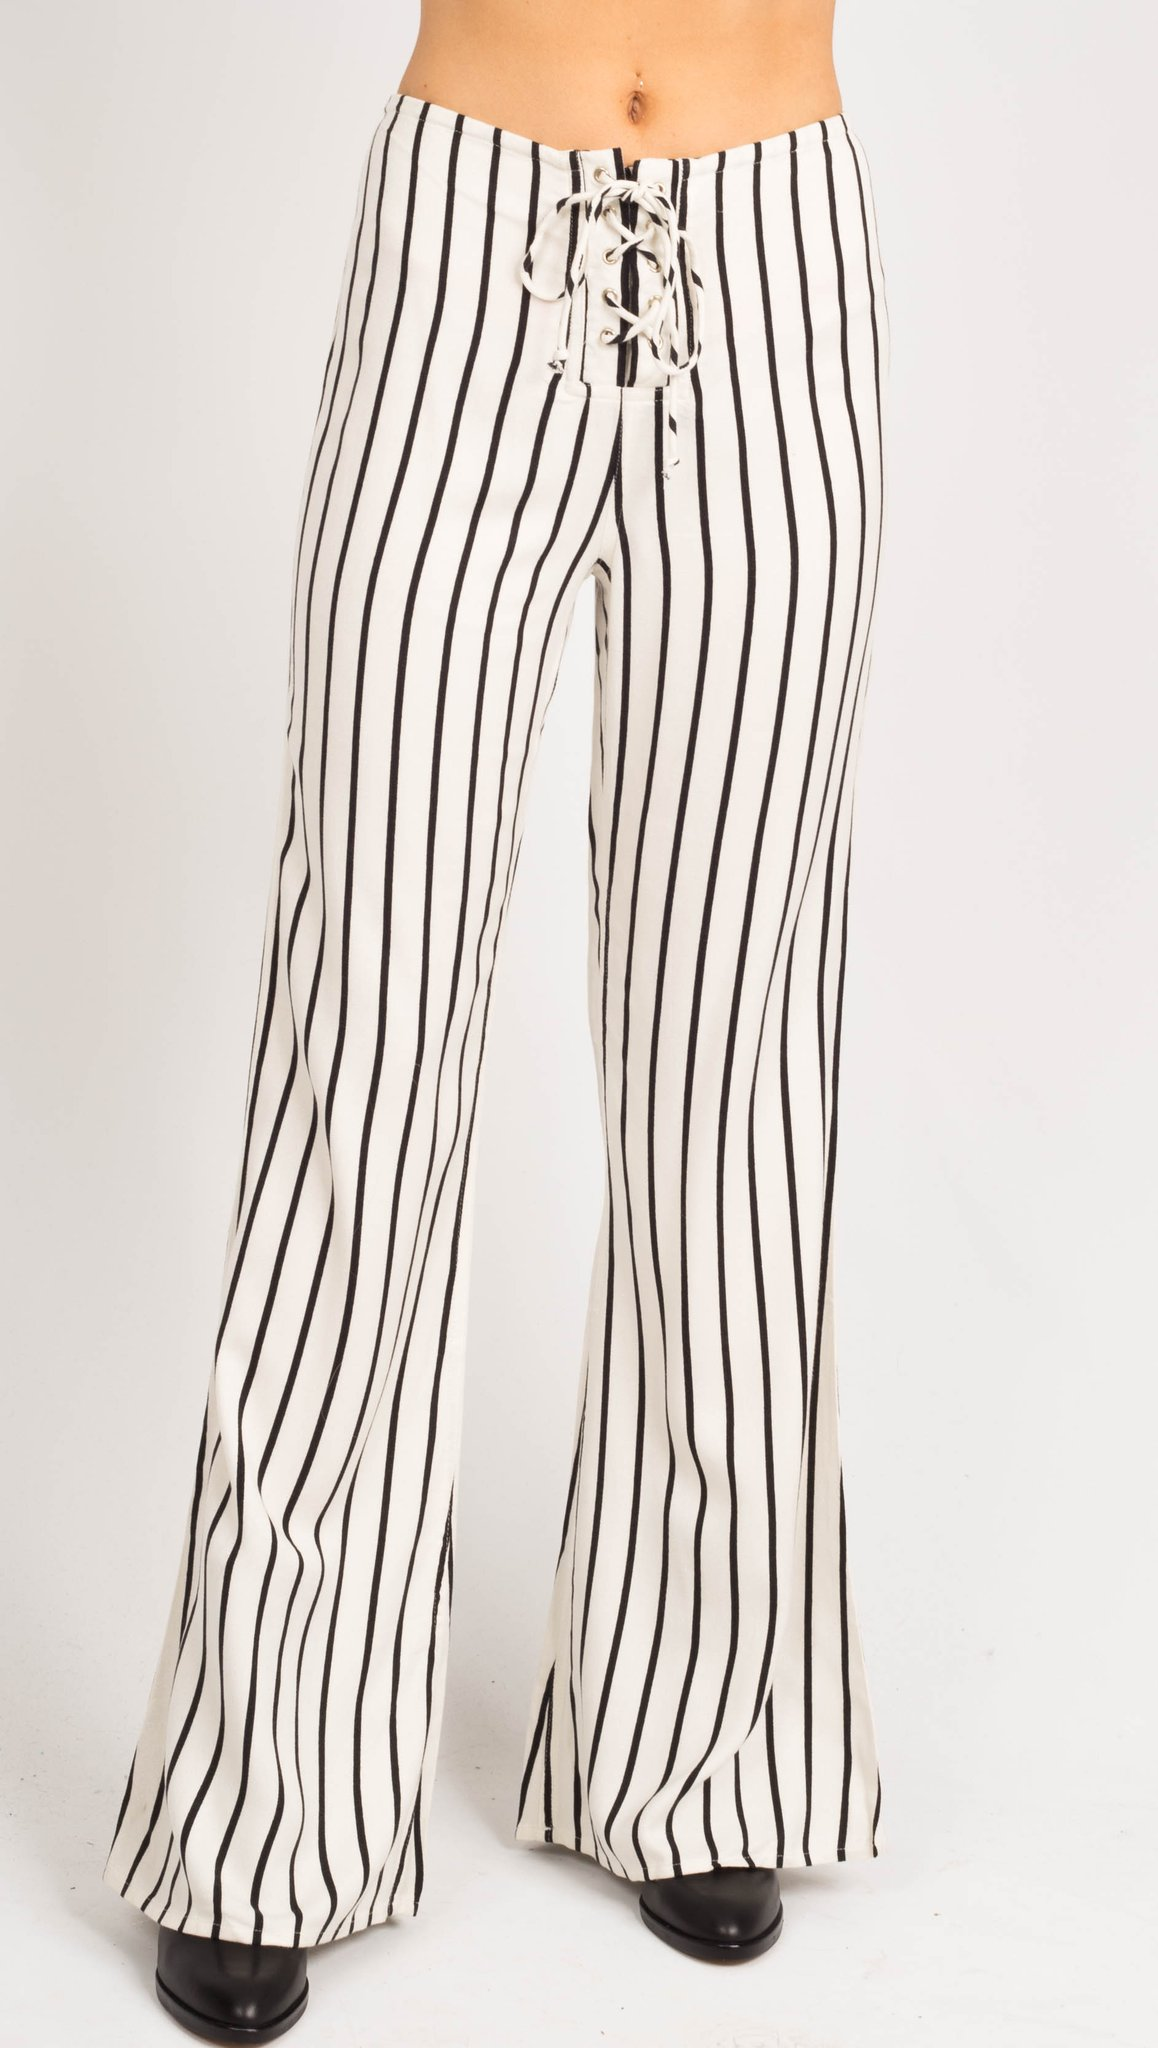 Black and White Striped Pants – Vandevort